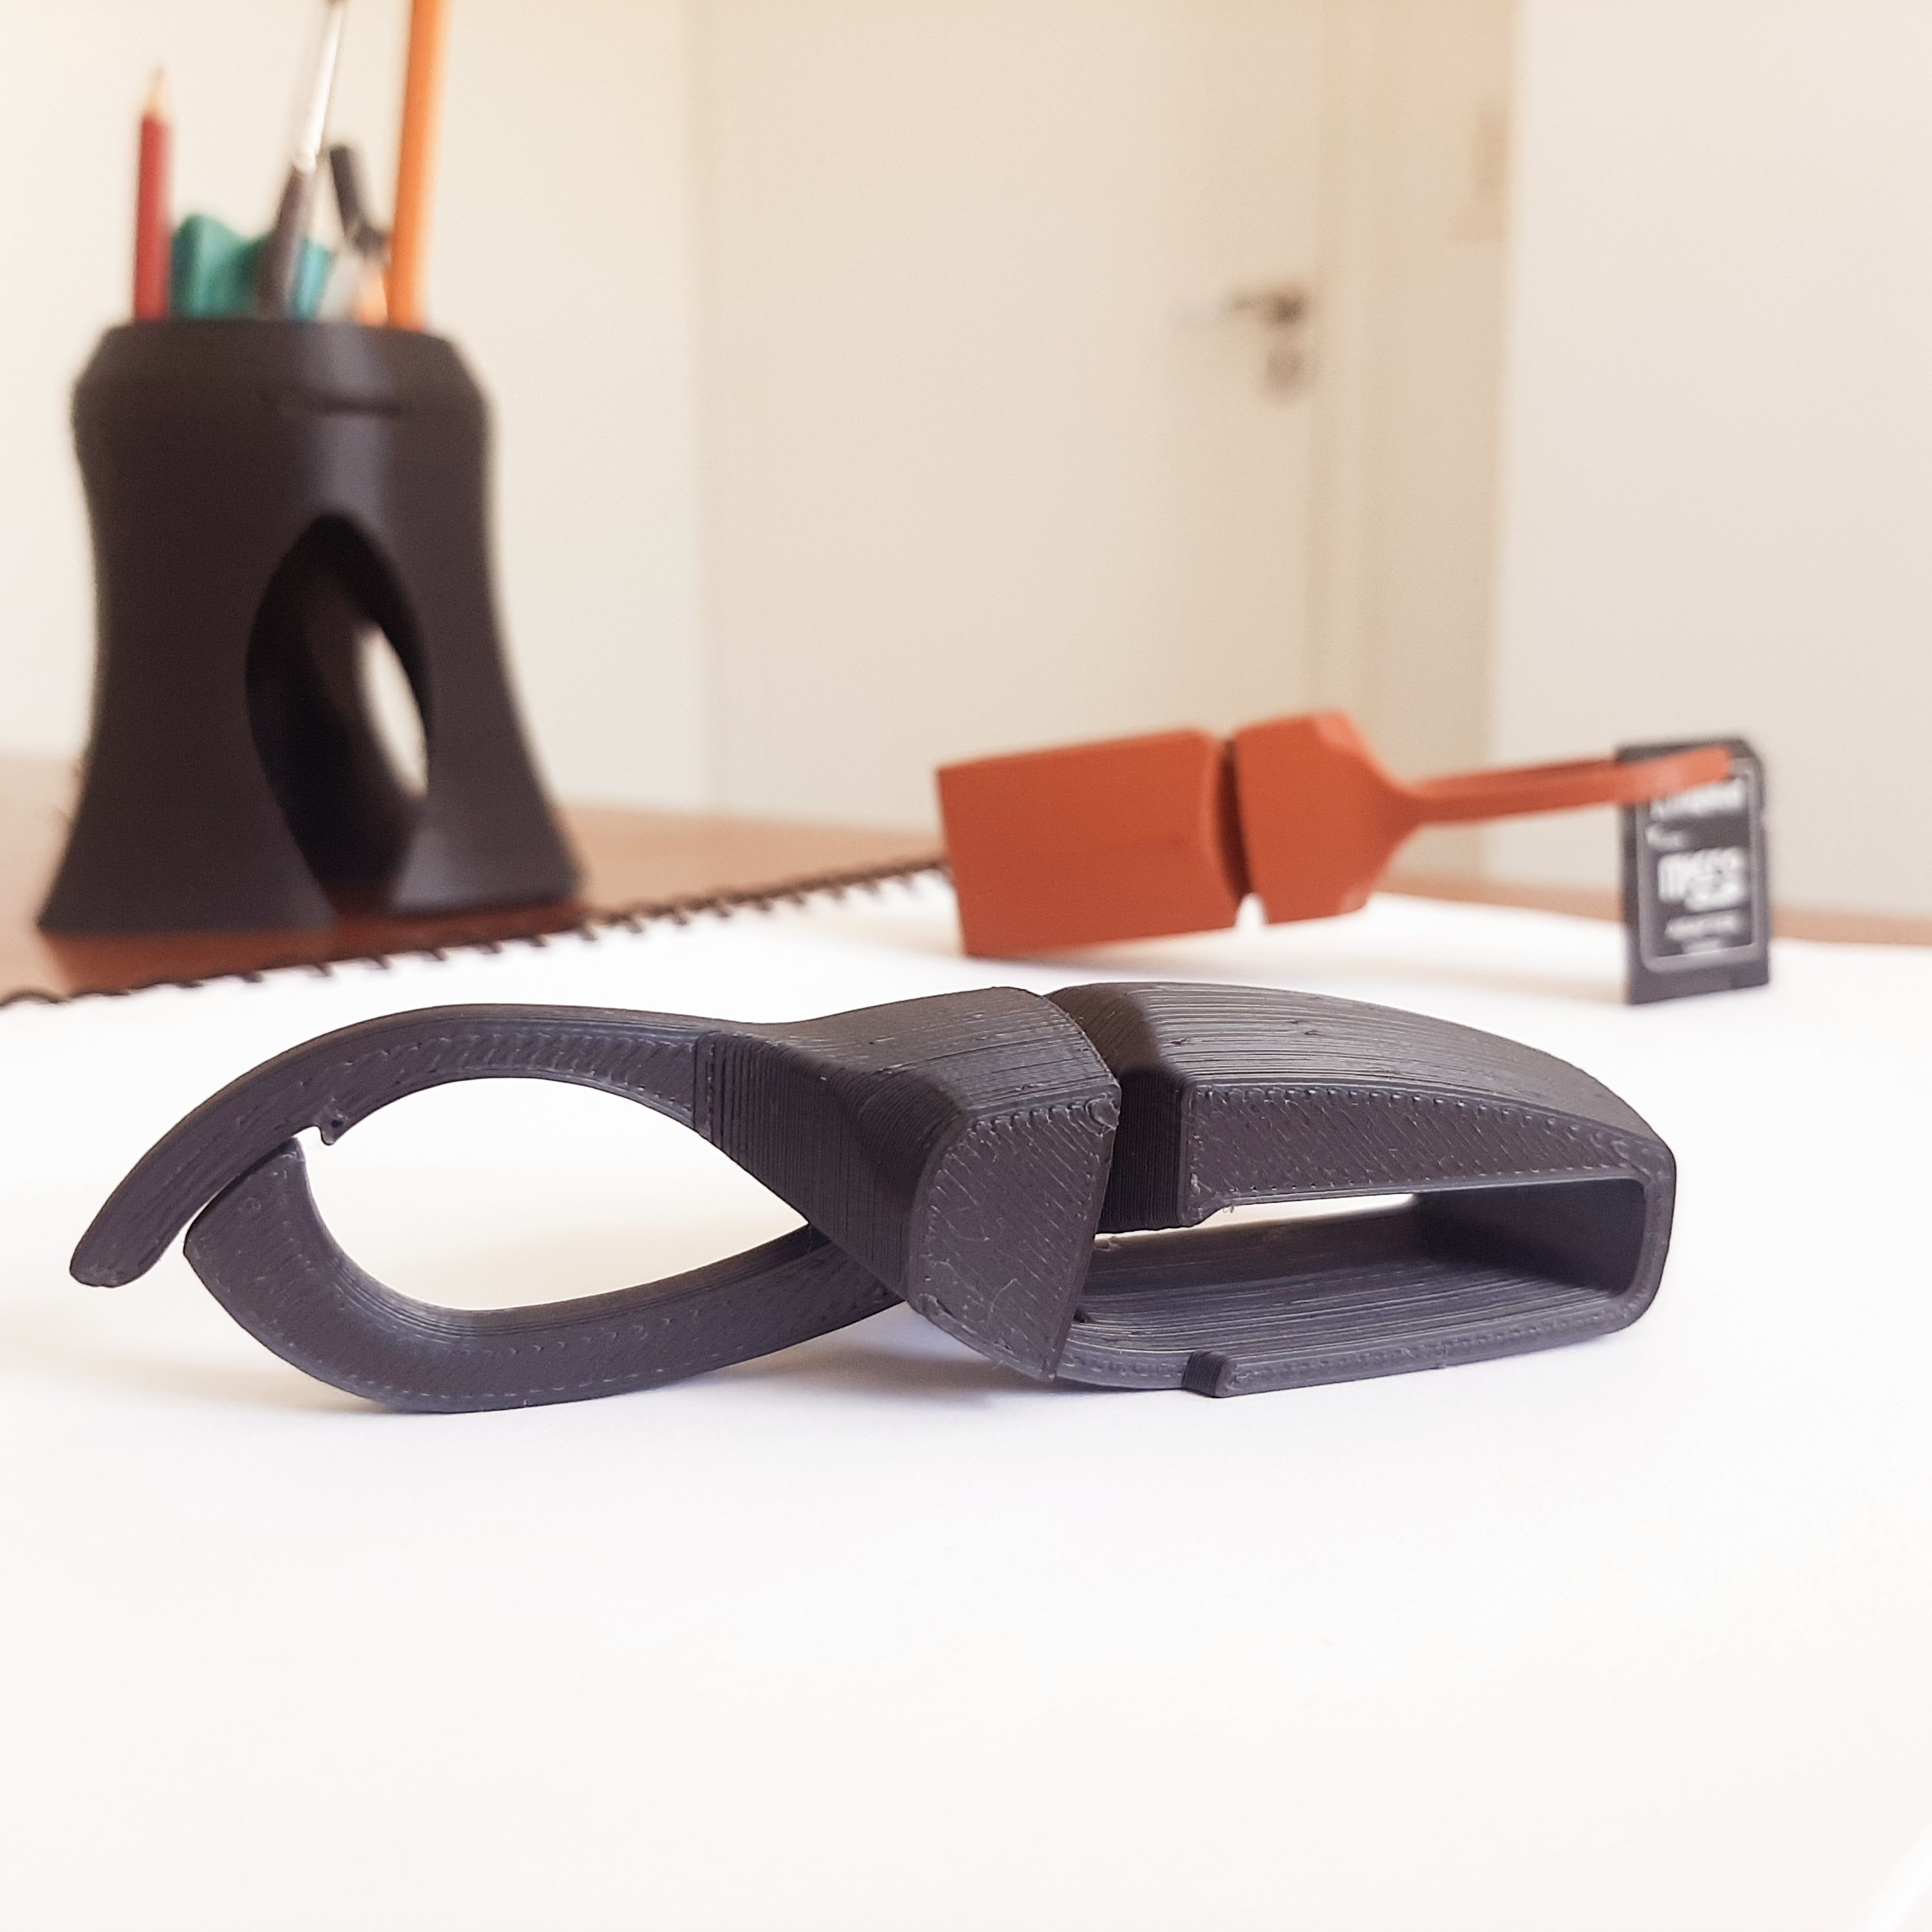 20201105_142203.jpg Download STL file Beetle clothespin • 3D printer design, lucasfernandesbos